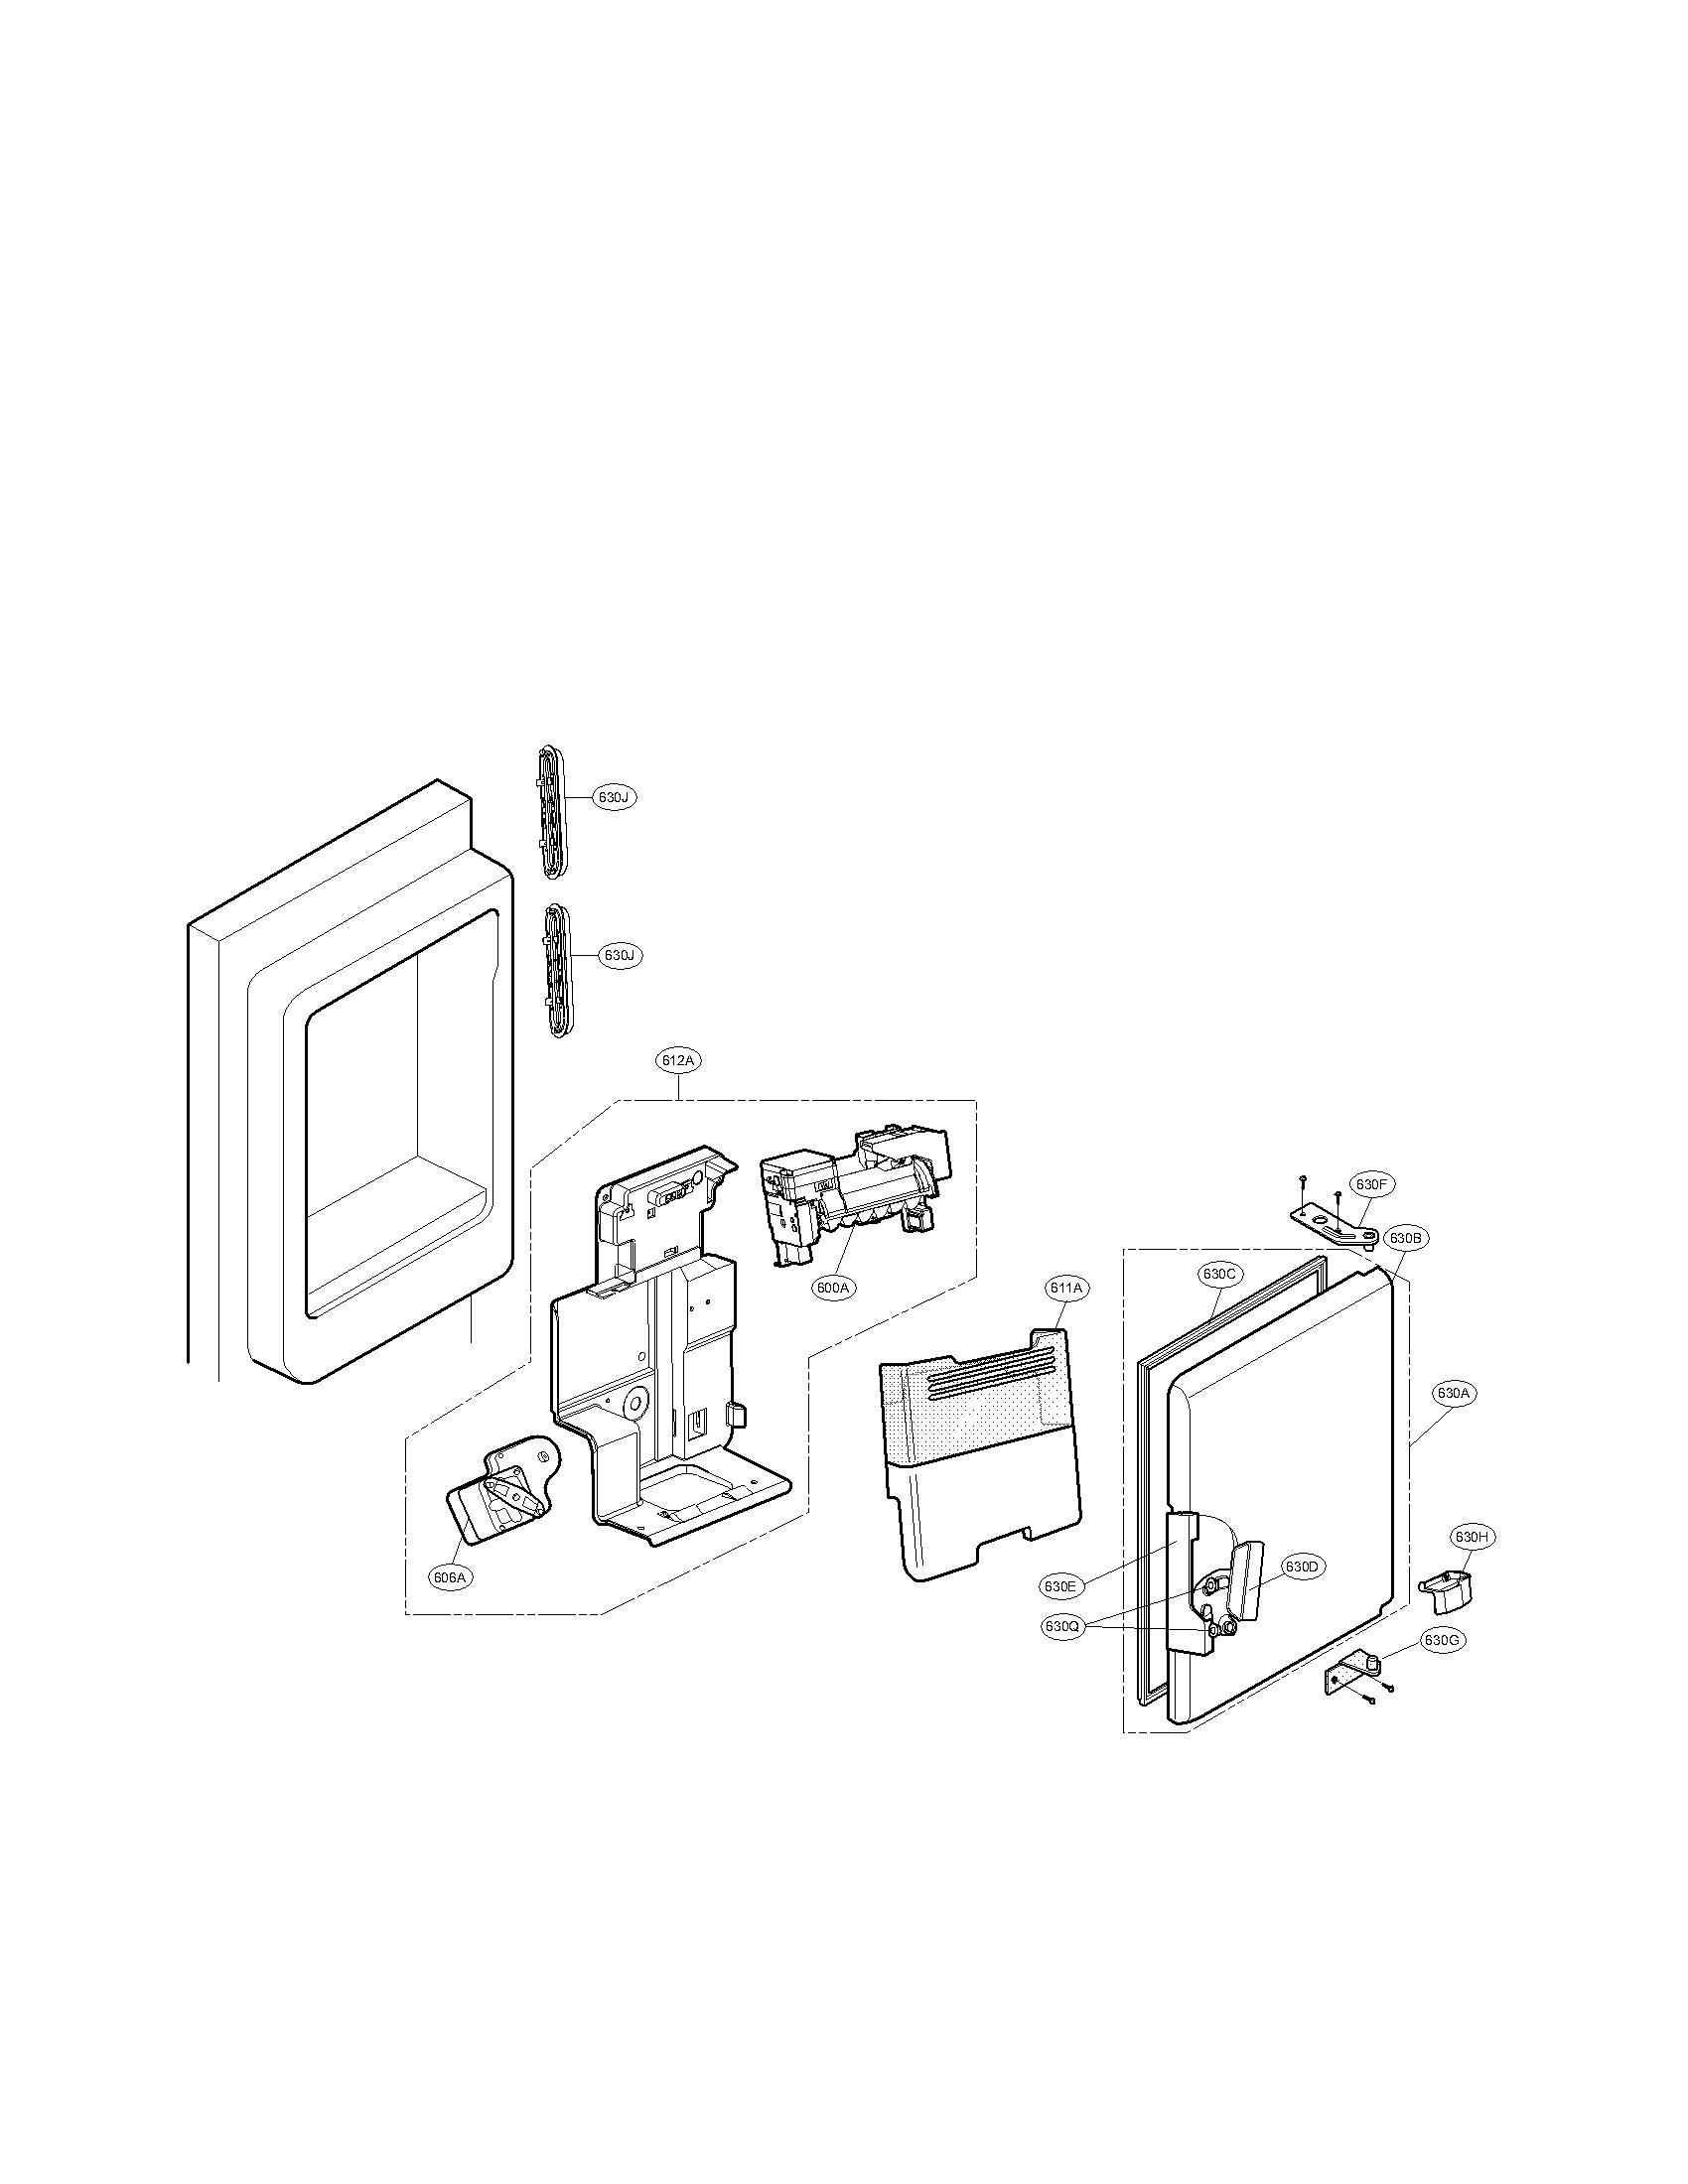 Lg model LMX28988ST/00 bottom-mount refrigerator genuine parts